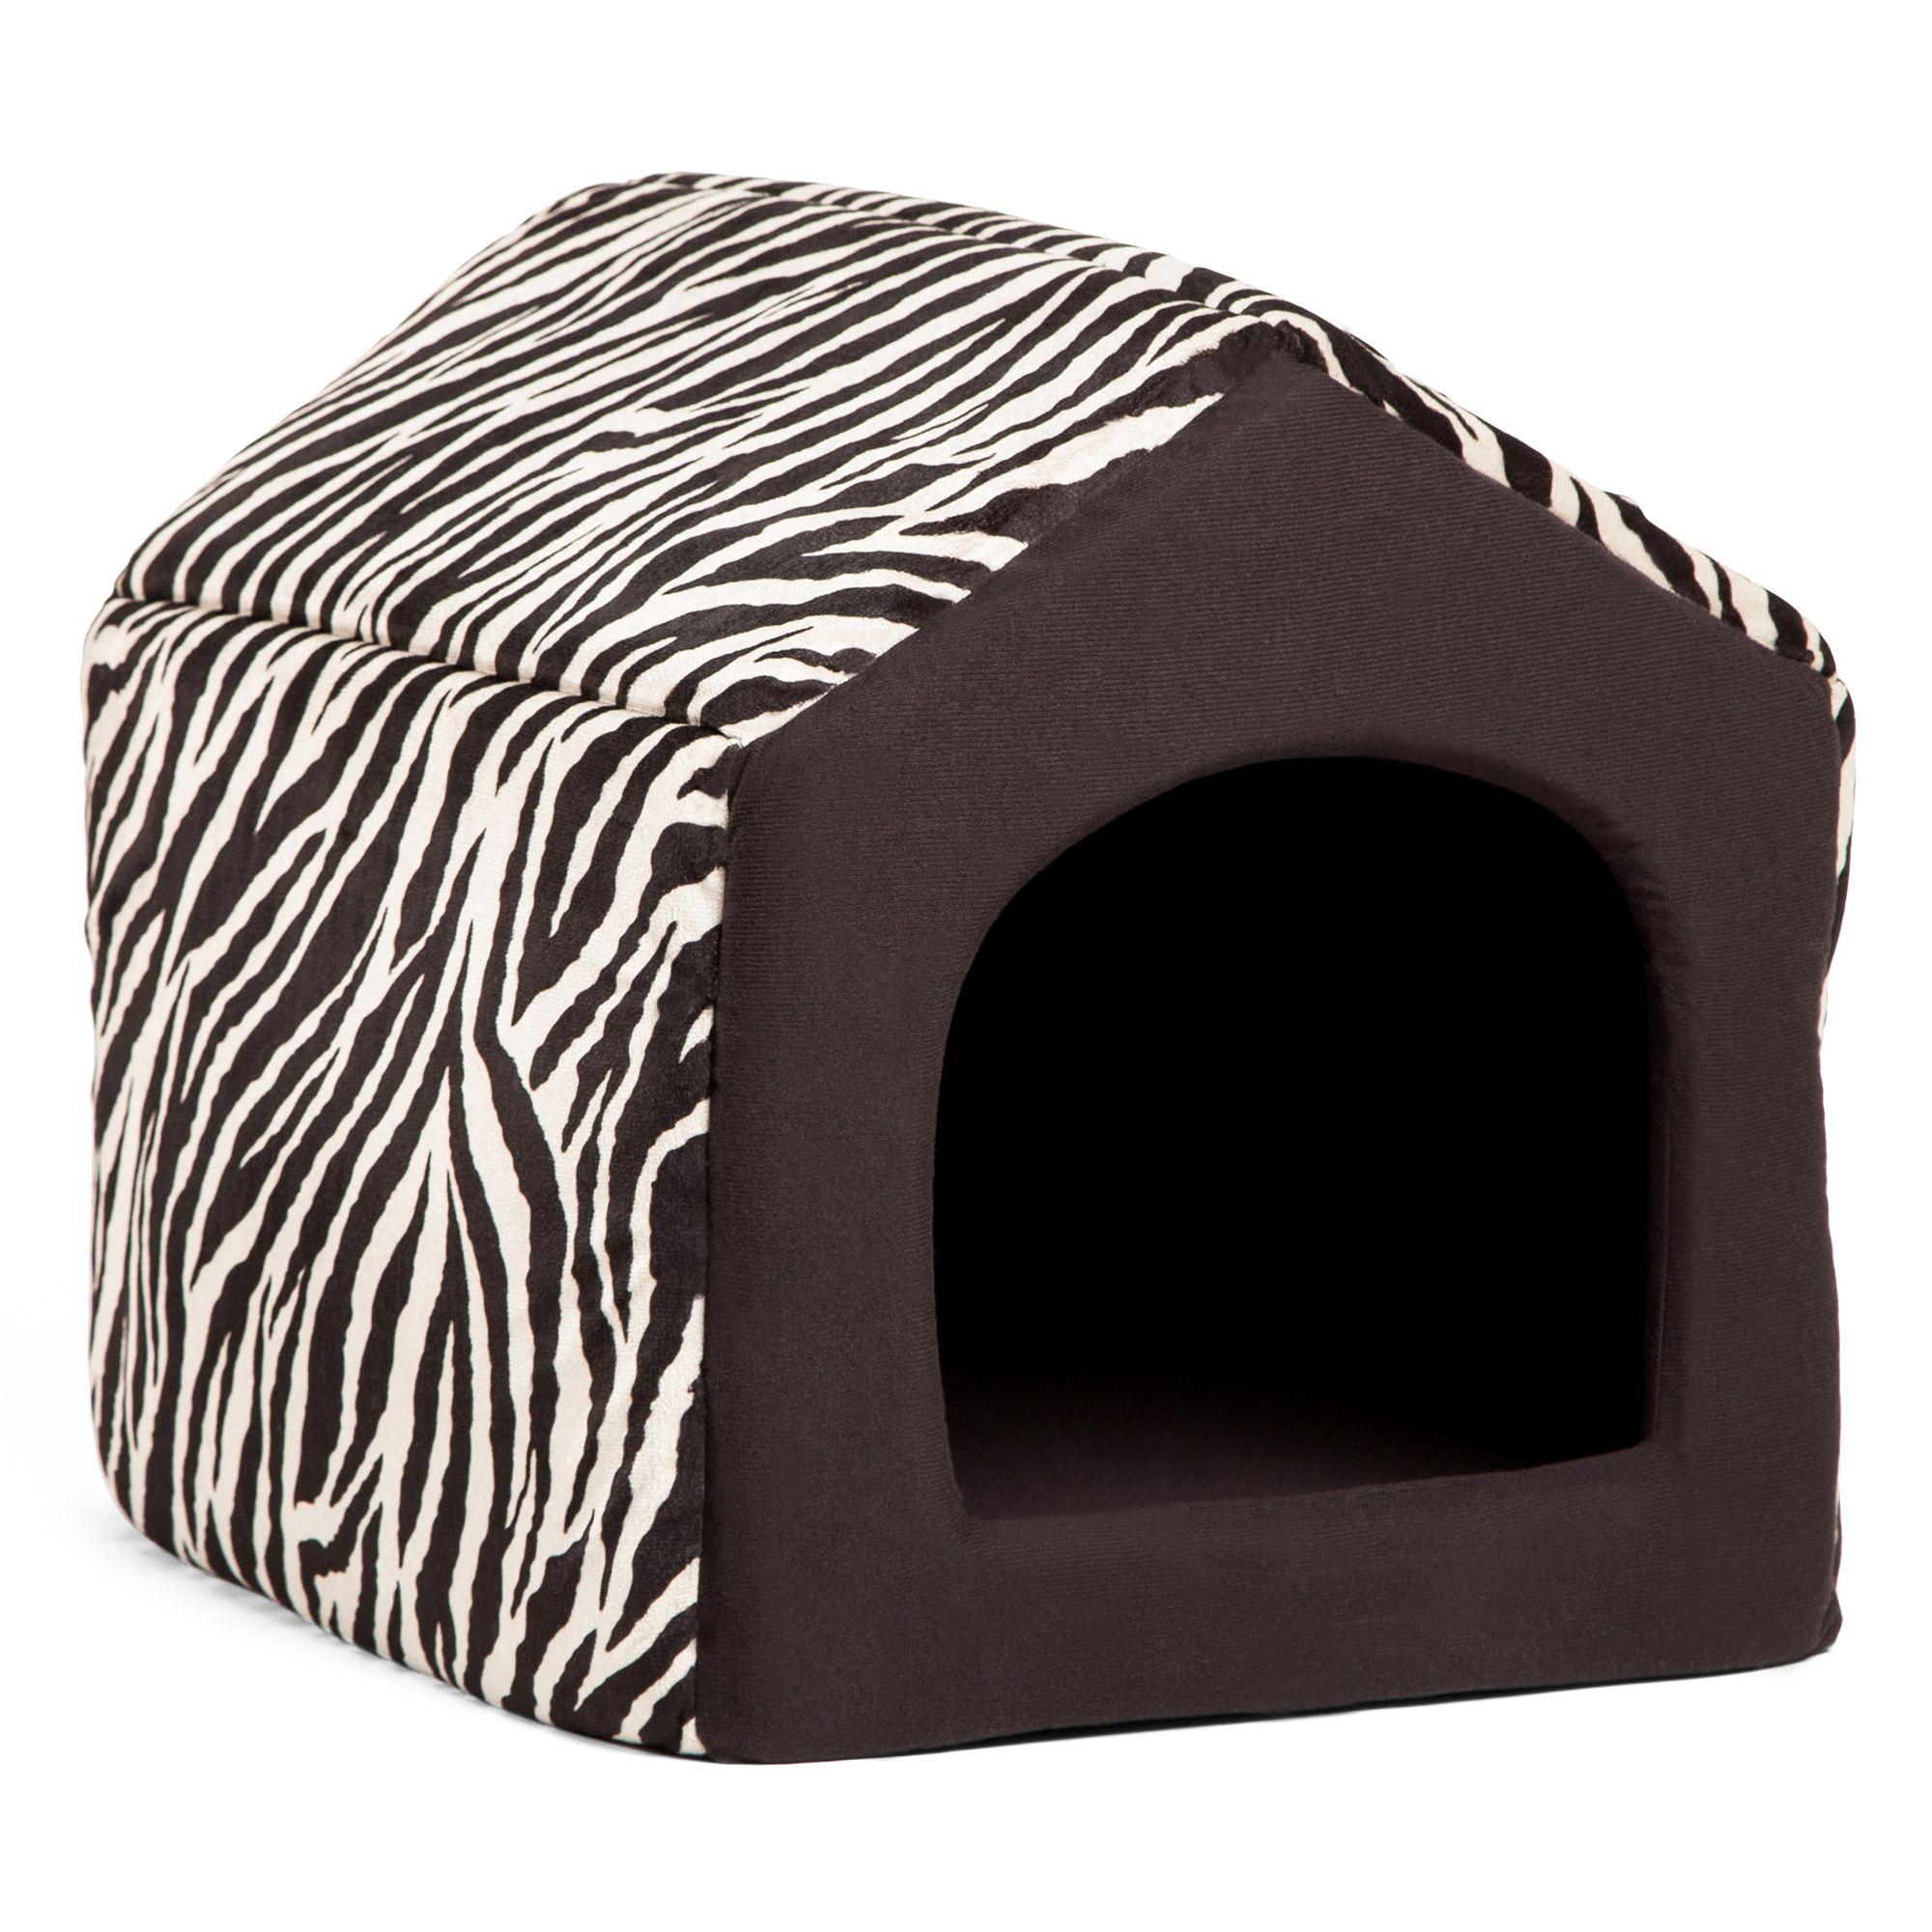 Best Friends By Sheri Convertible House Animal Print Pet Bed Size 16l X 15w X 14h Zebra